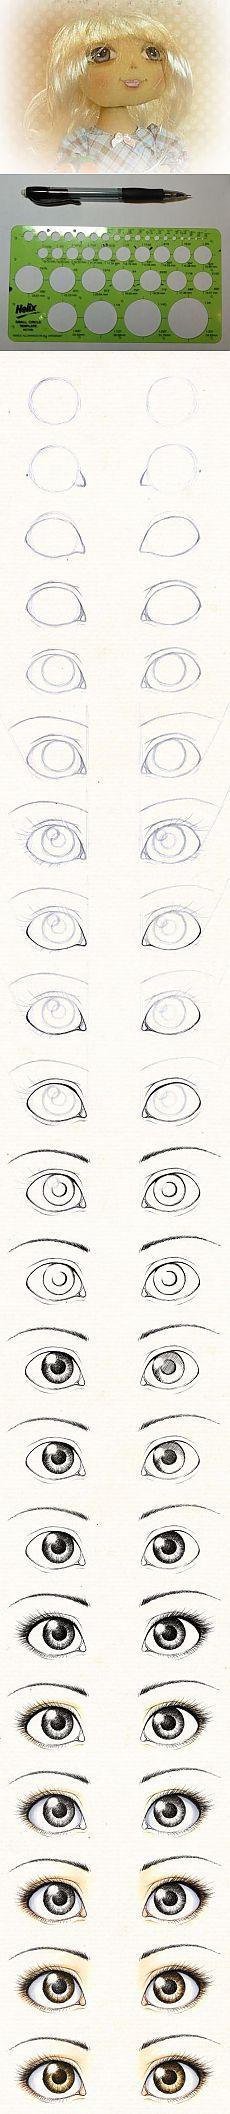 Dibujar los ojos de la muñeca textil.